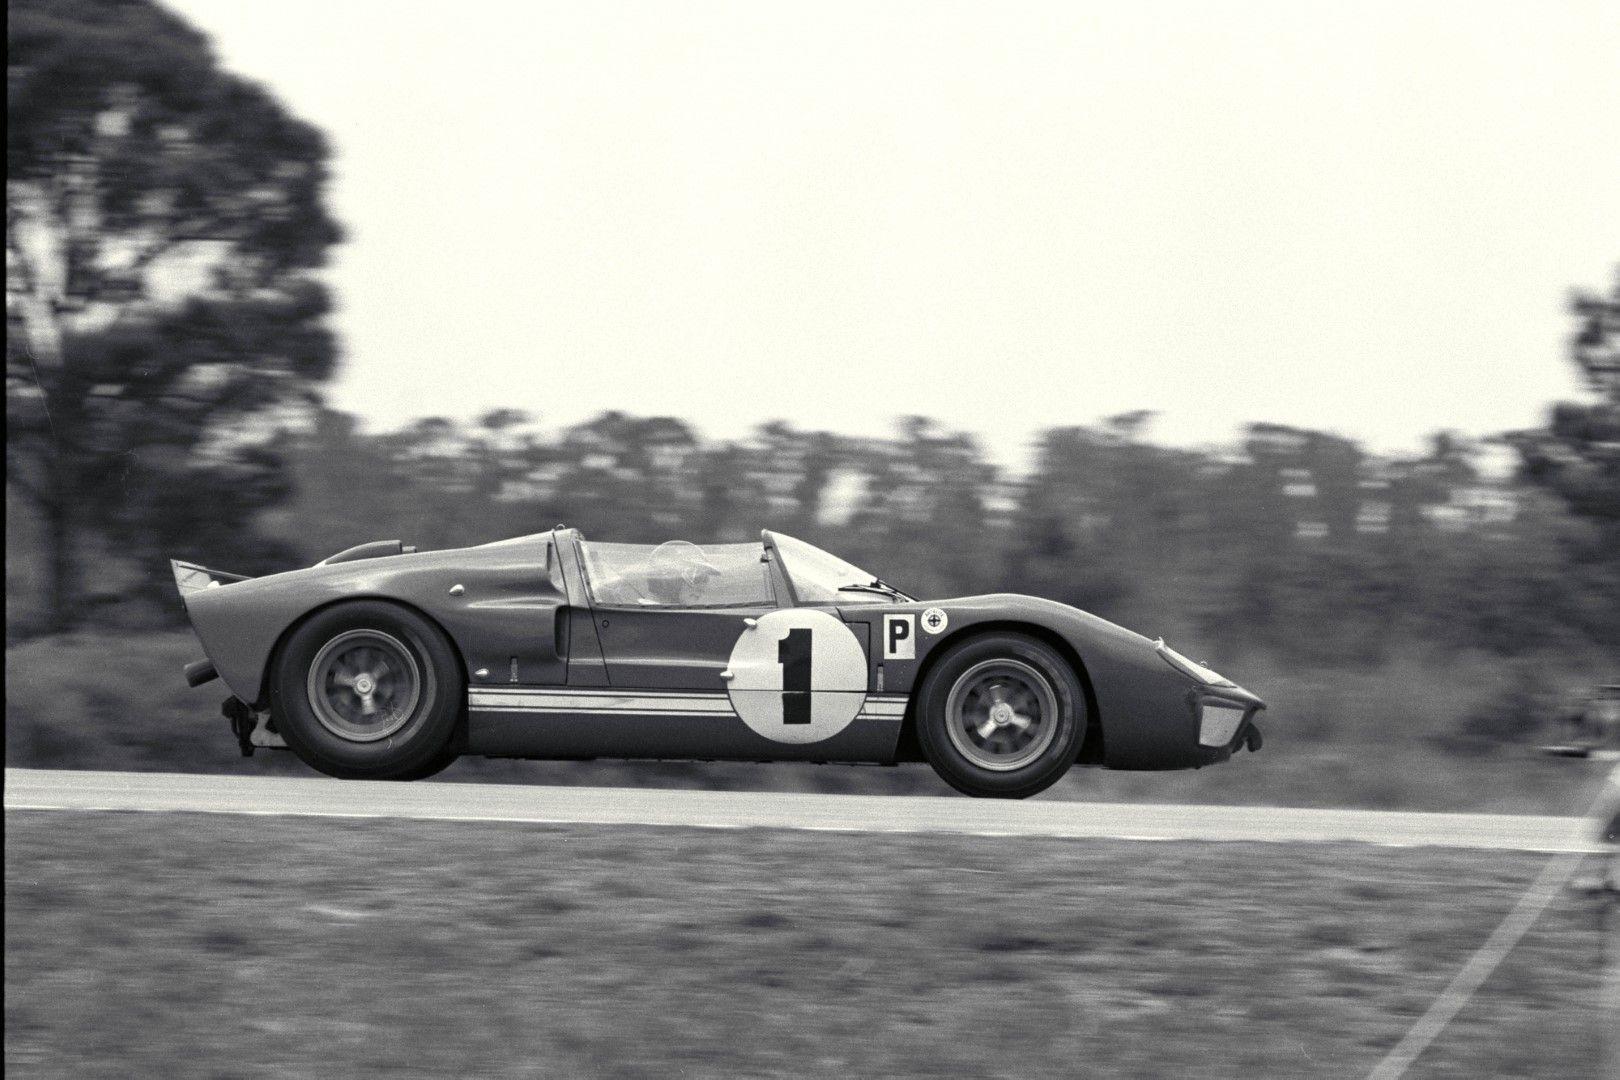 Sebring 12 Hour Race Sebring Fl 1966 Winning Ford Gt40 X 1 Roadster Driven By Ken Miles Lloyd Ruby Ford Gt40